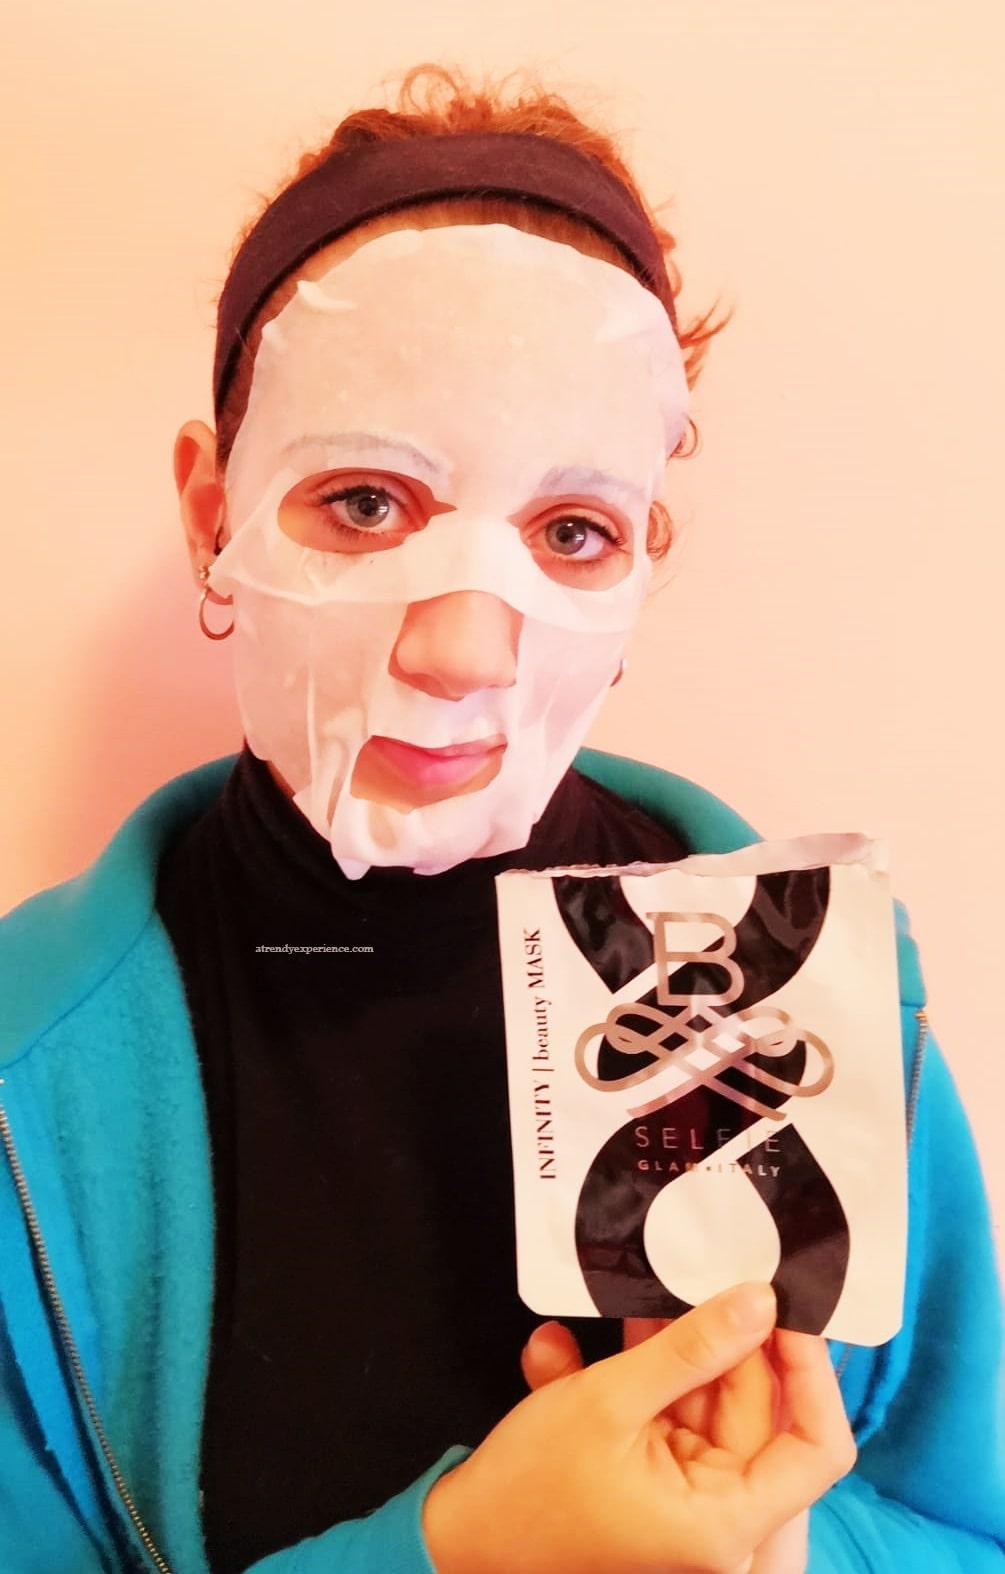 maschera B SELFIE INFINITY recensione